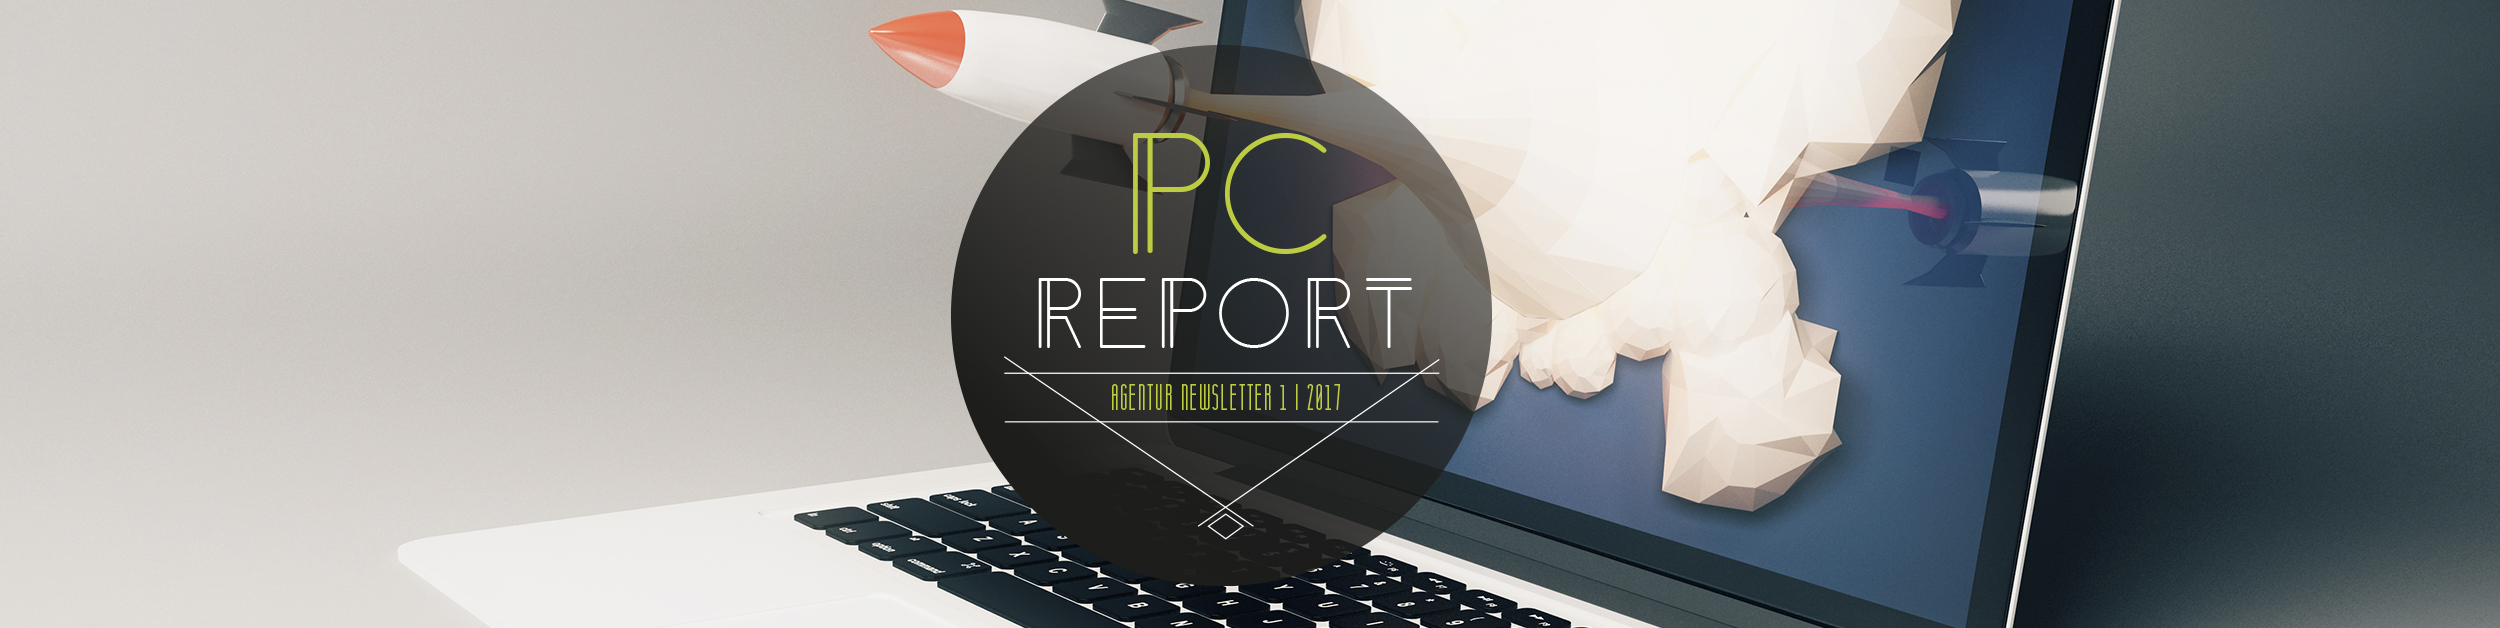 PC Report.jpg